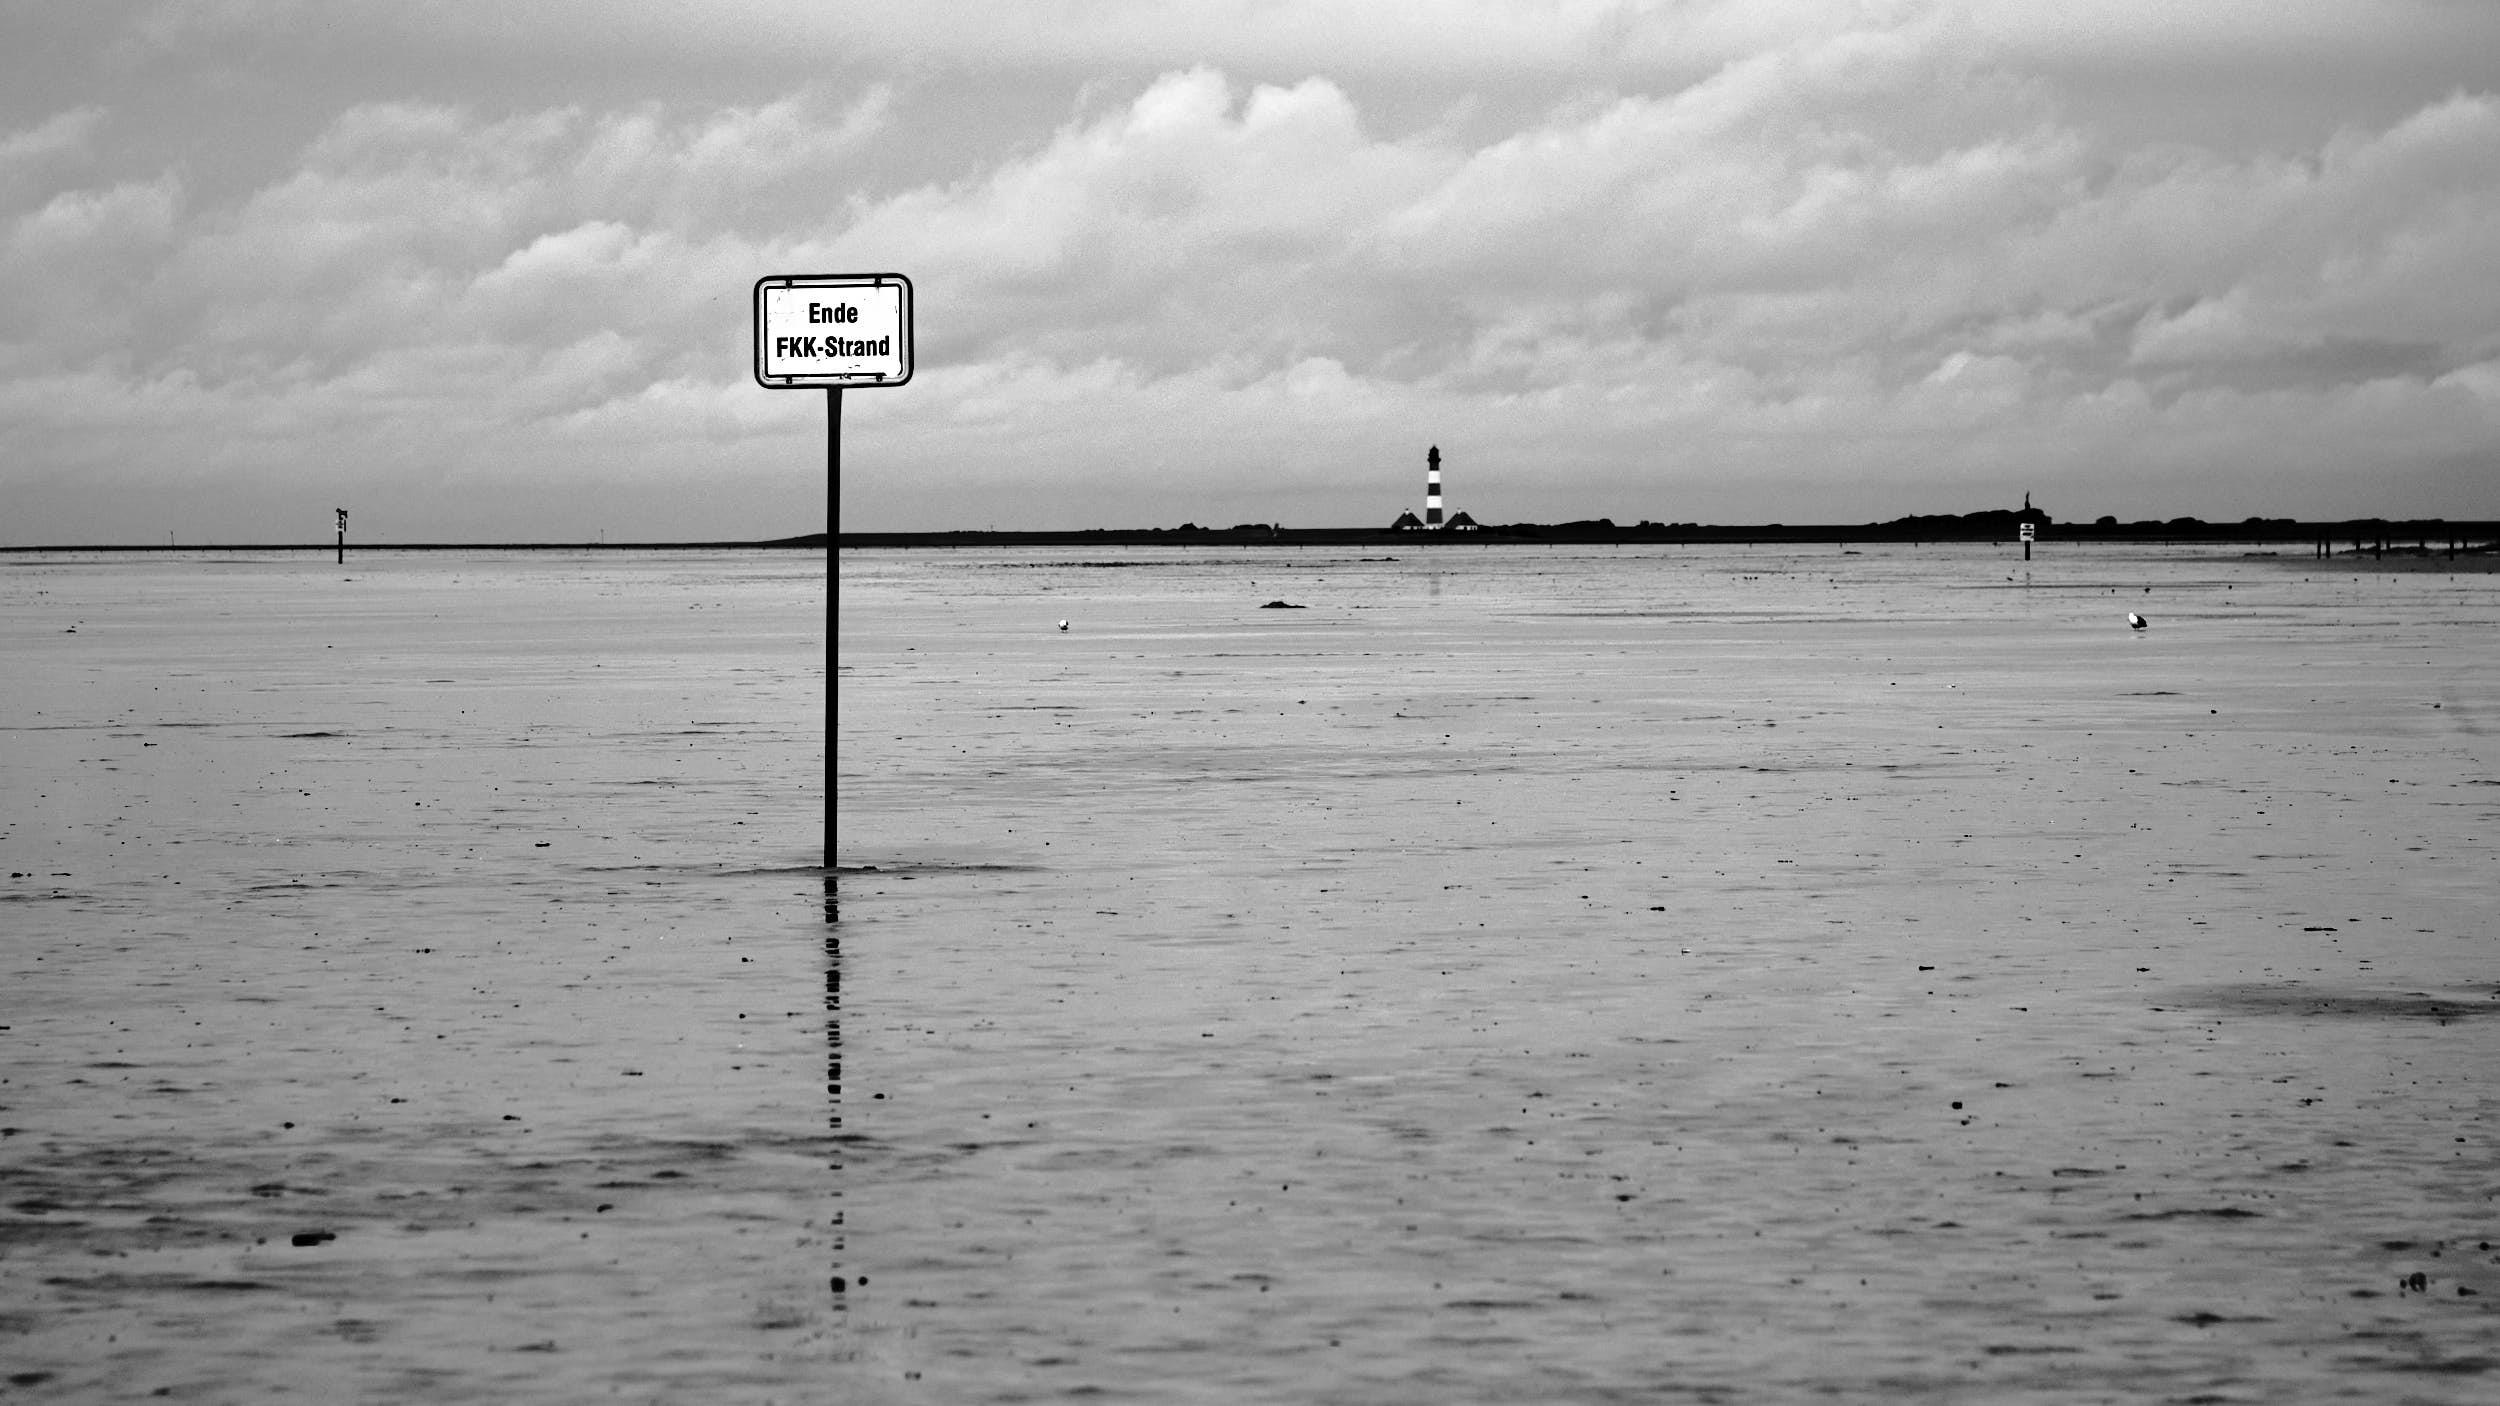 Schild Fkk-Strand, Sankt-Peter-Ording, Leuchtturm Westerhäversand